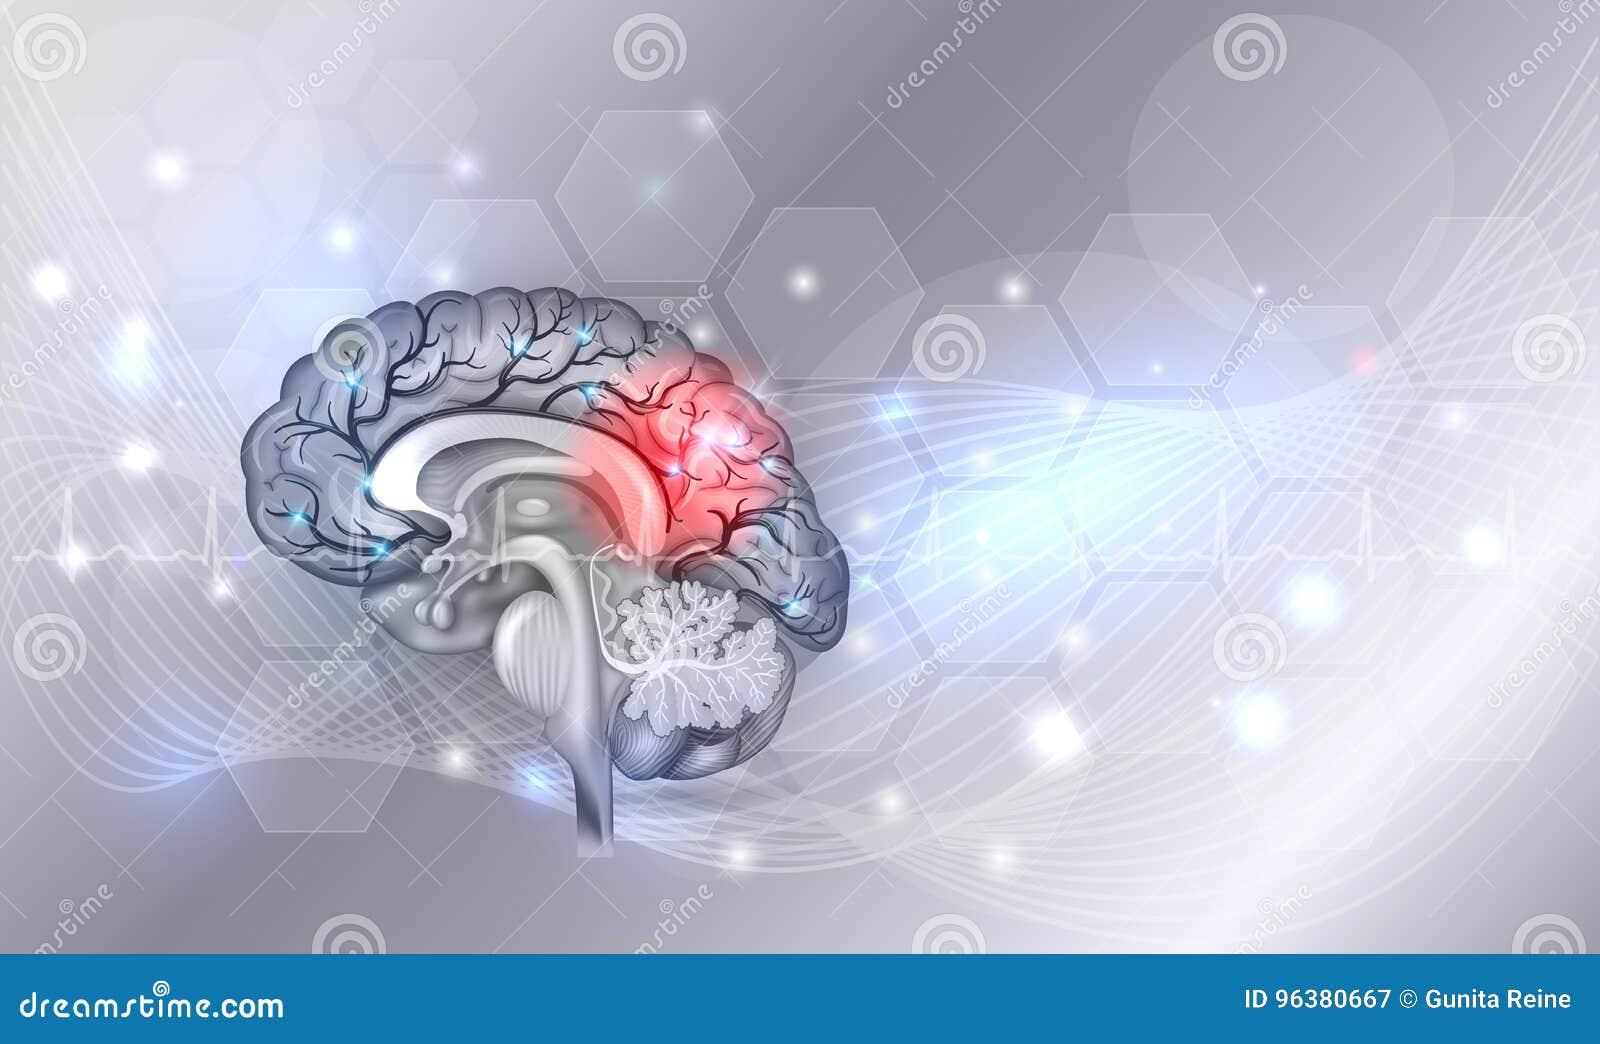 Brain problems